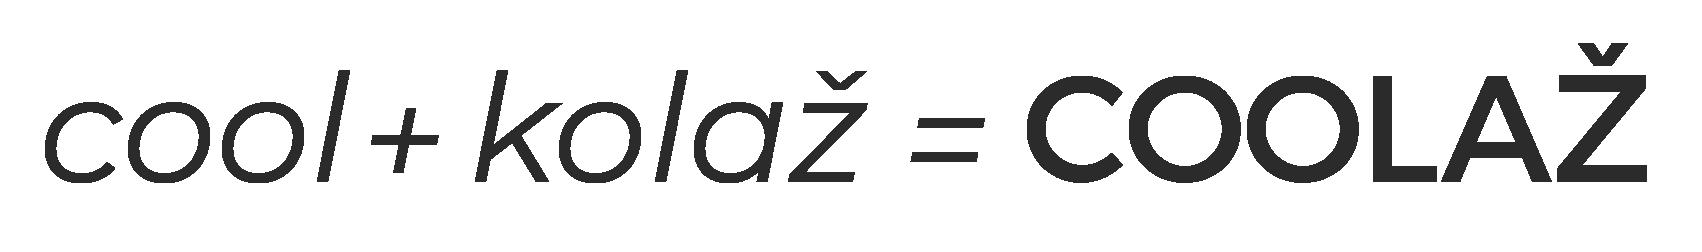 coolaz-01.png